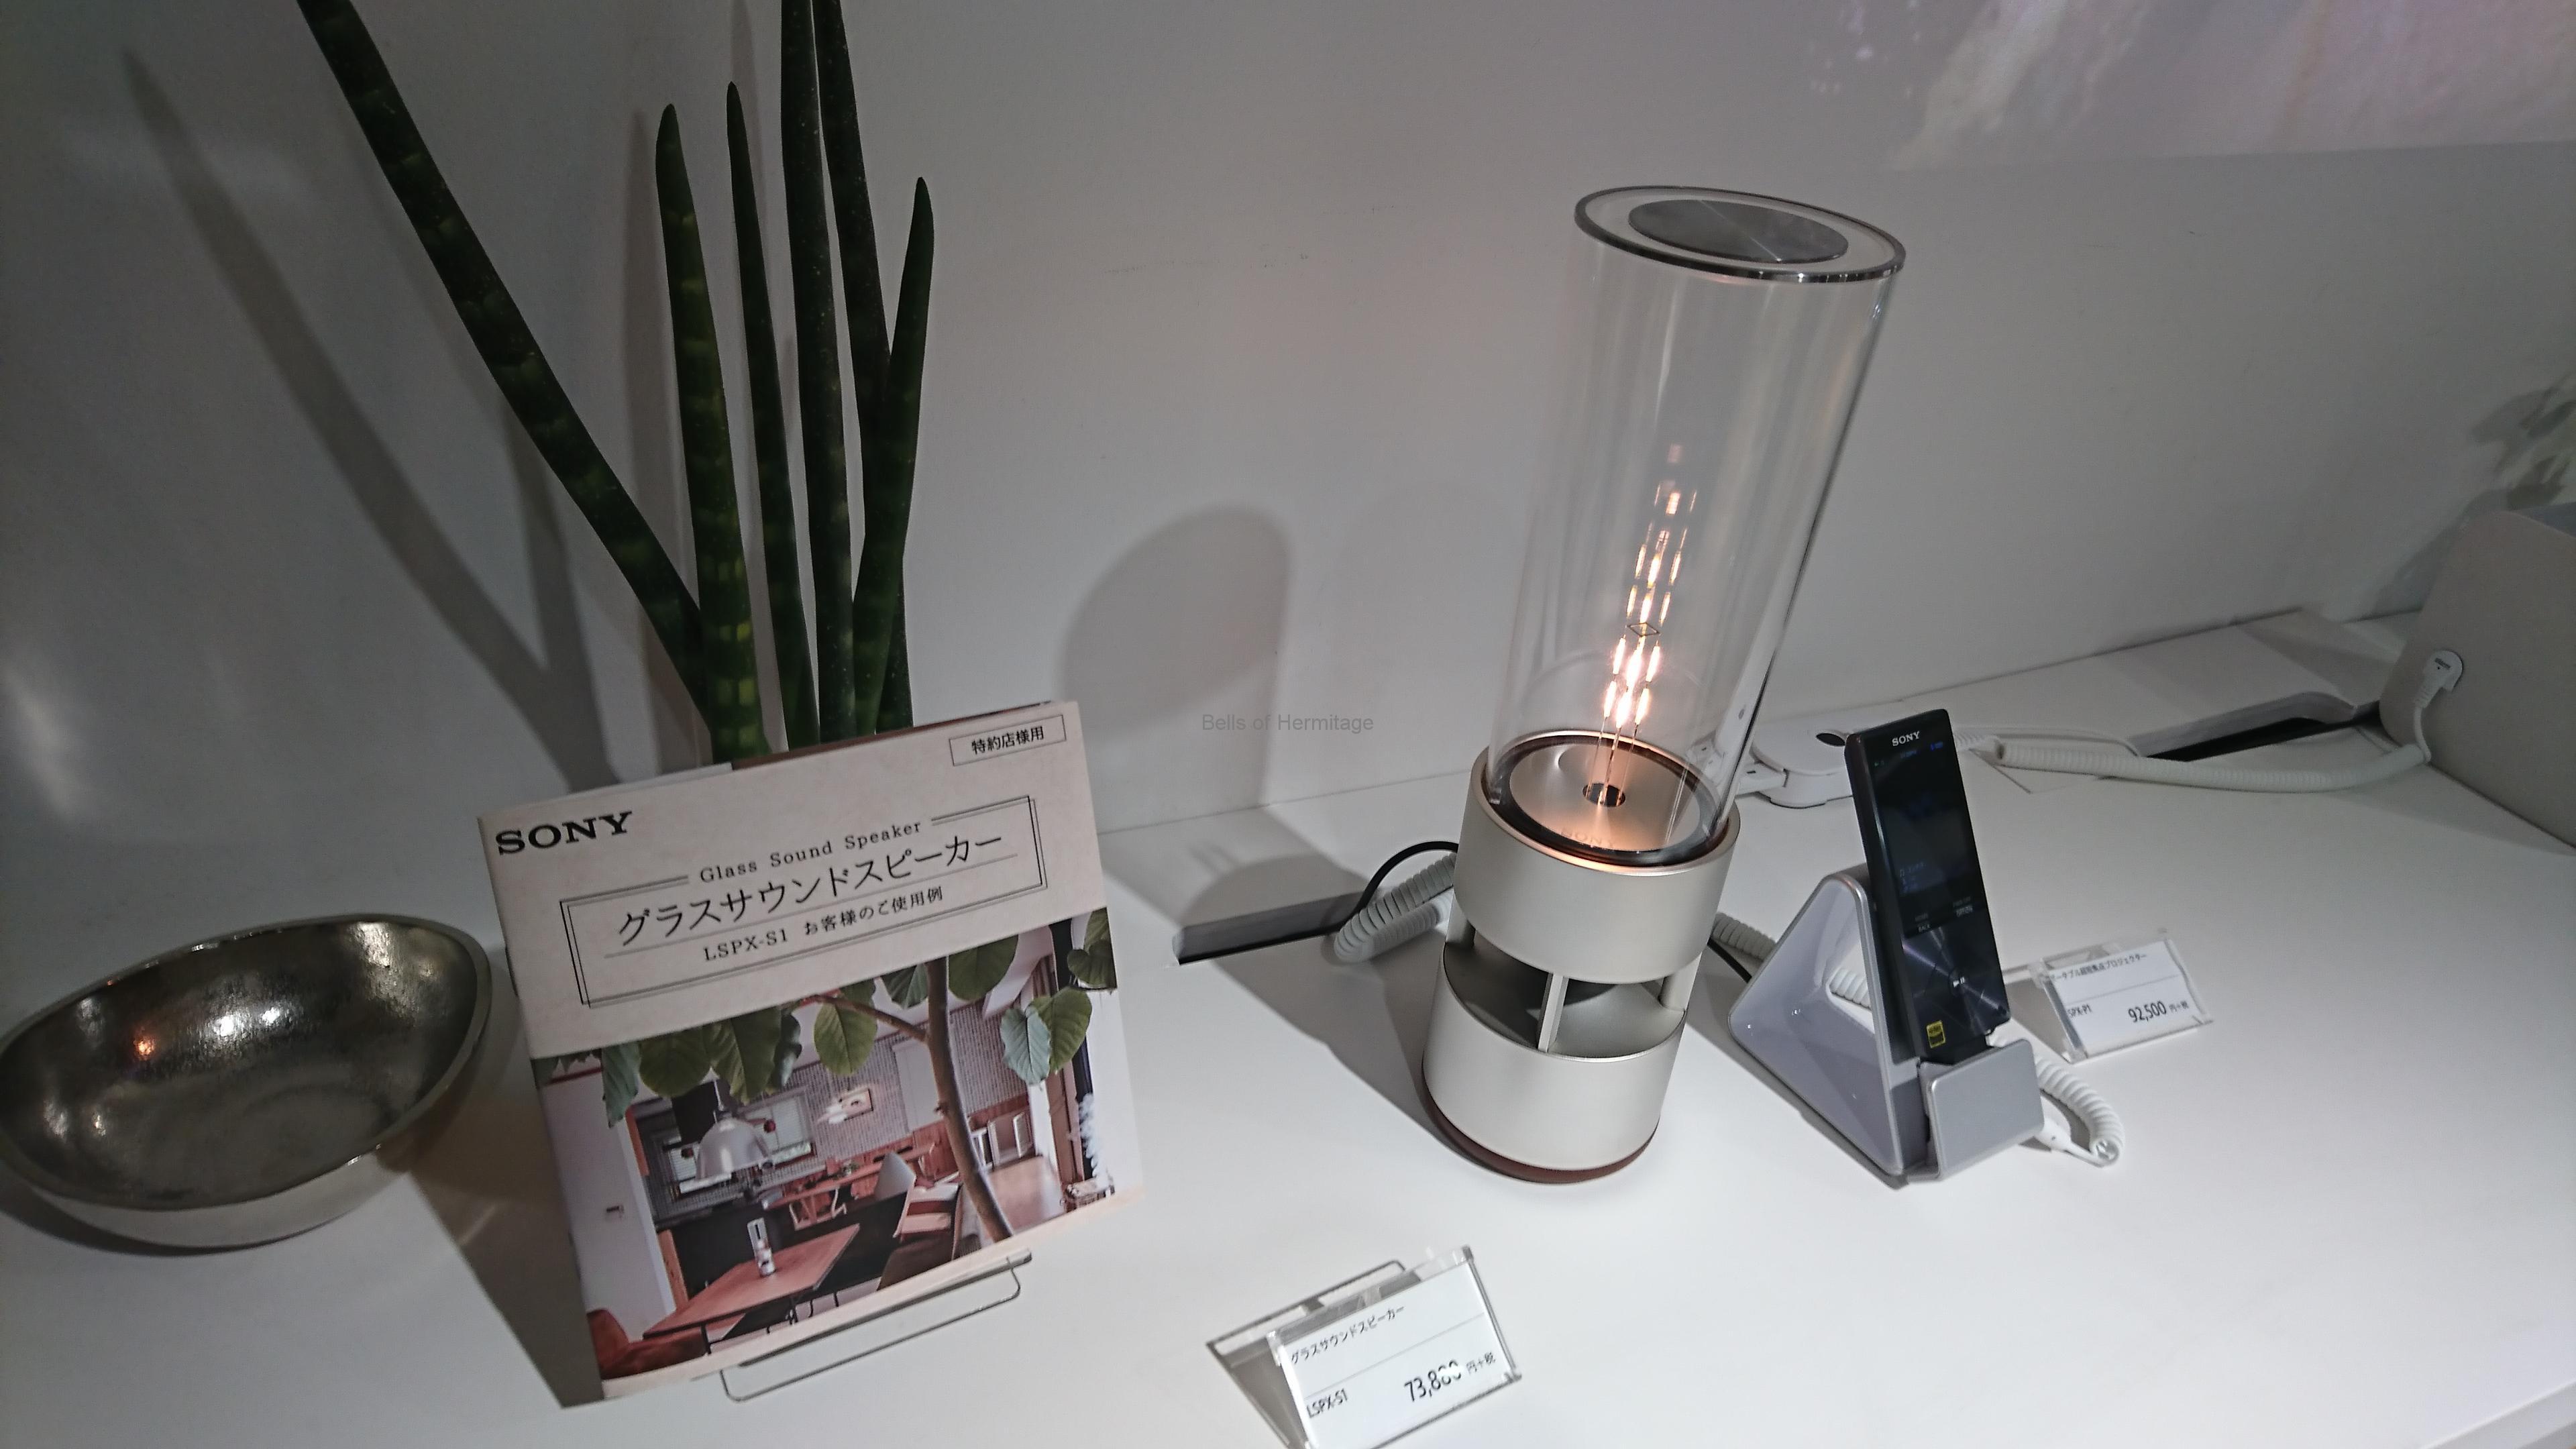 Sony グラスサウンドスピーカー Lspx S1の音を体験 Bells Of Hermitage エルミタージュの鐘